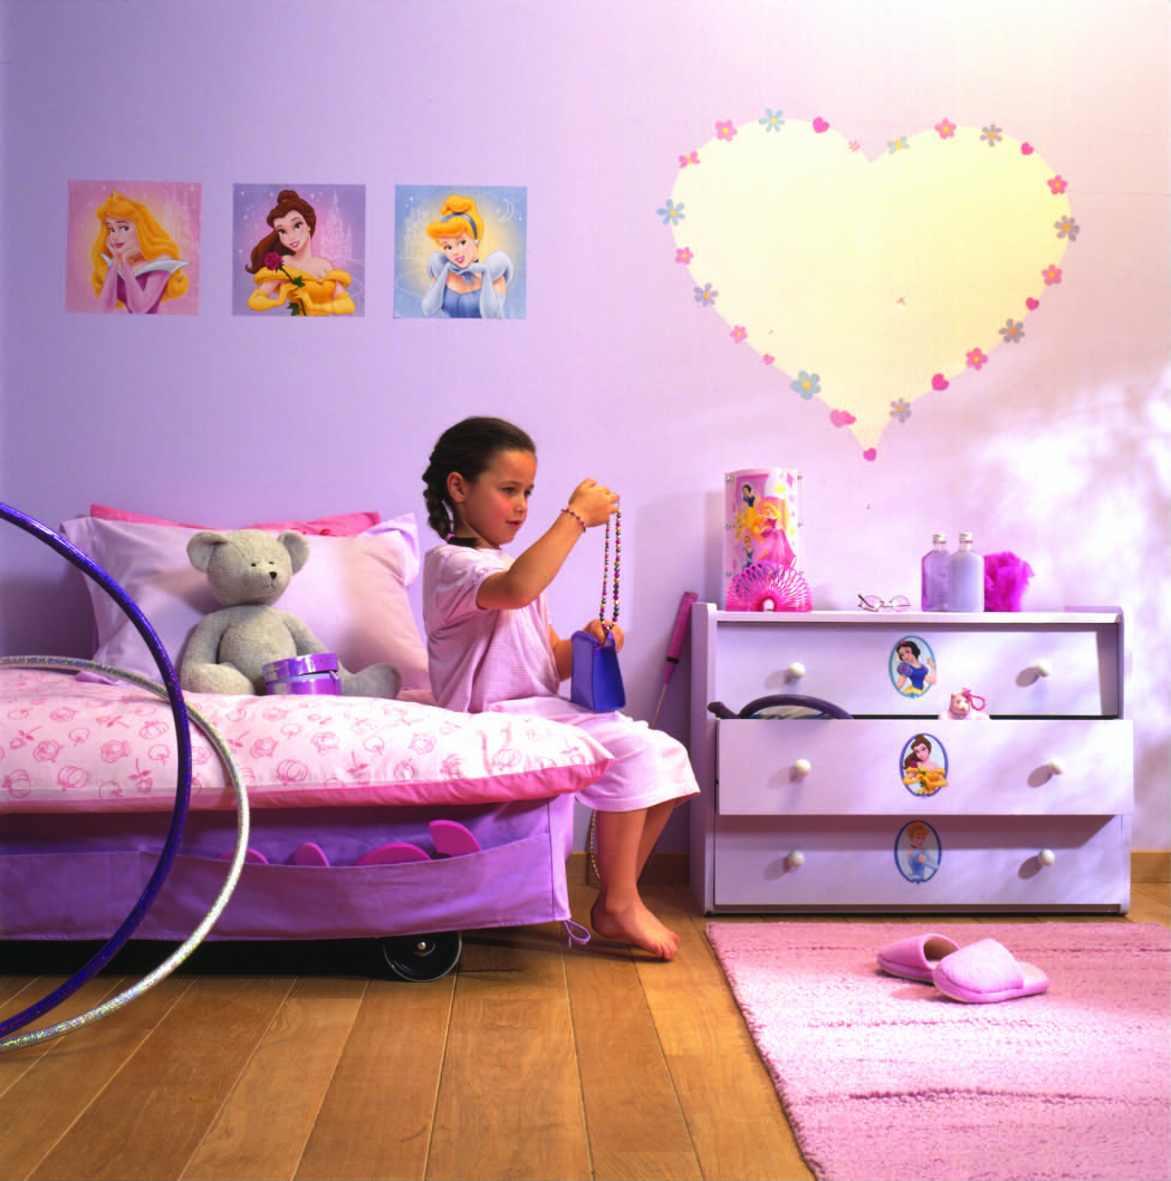 Dětský pokoj - Princezna